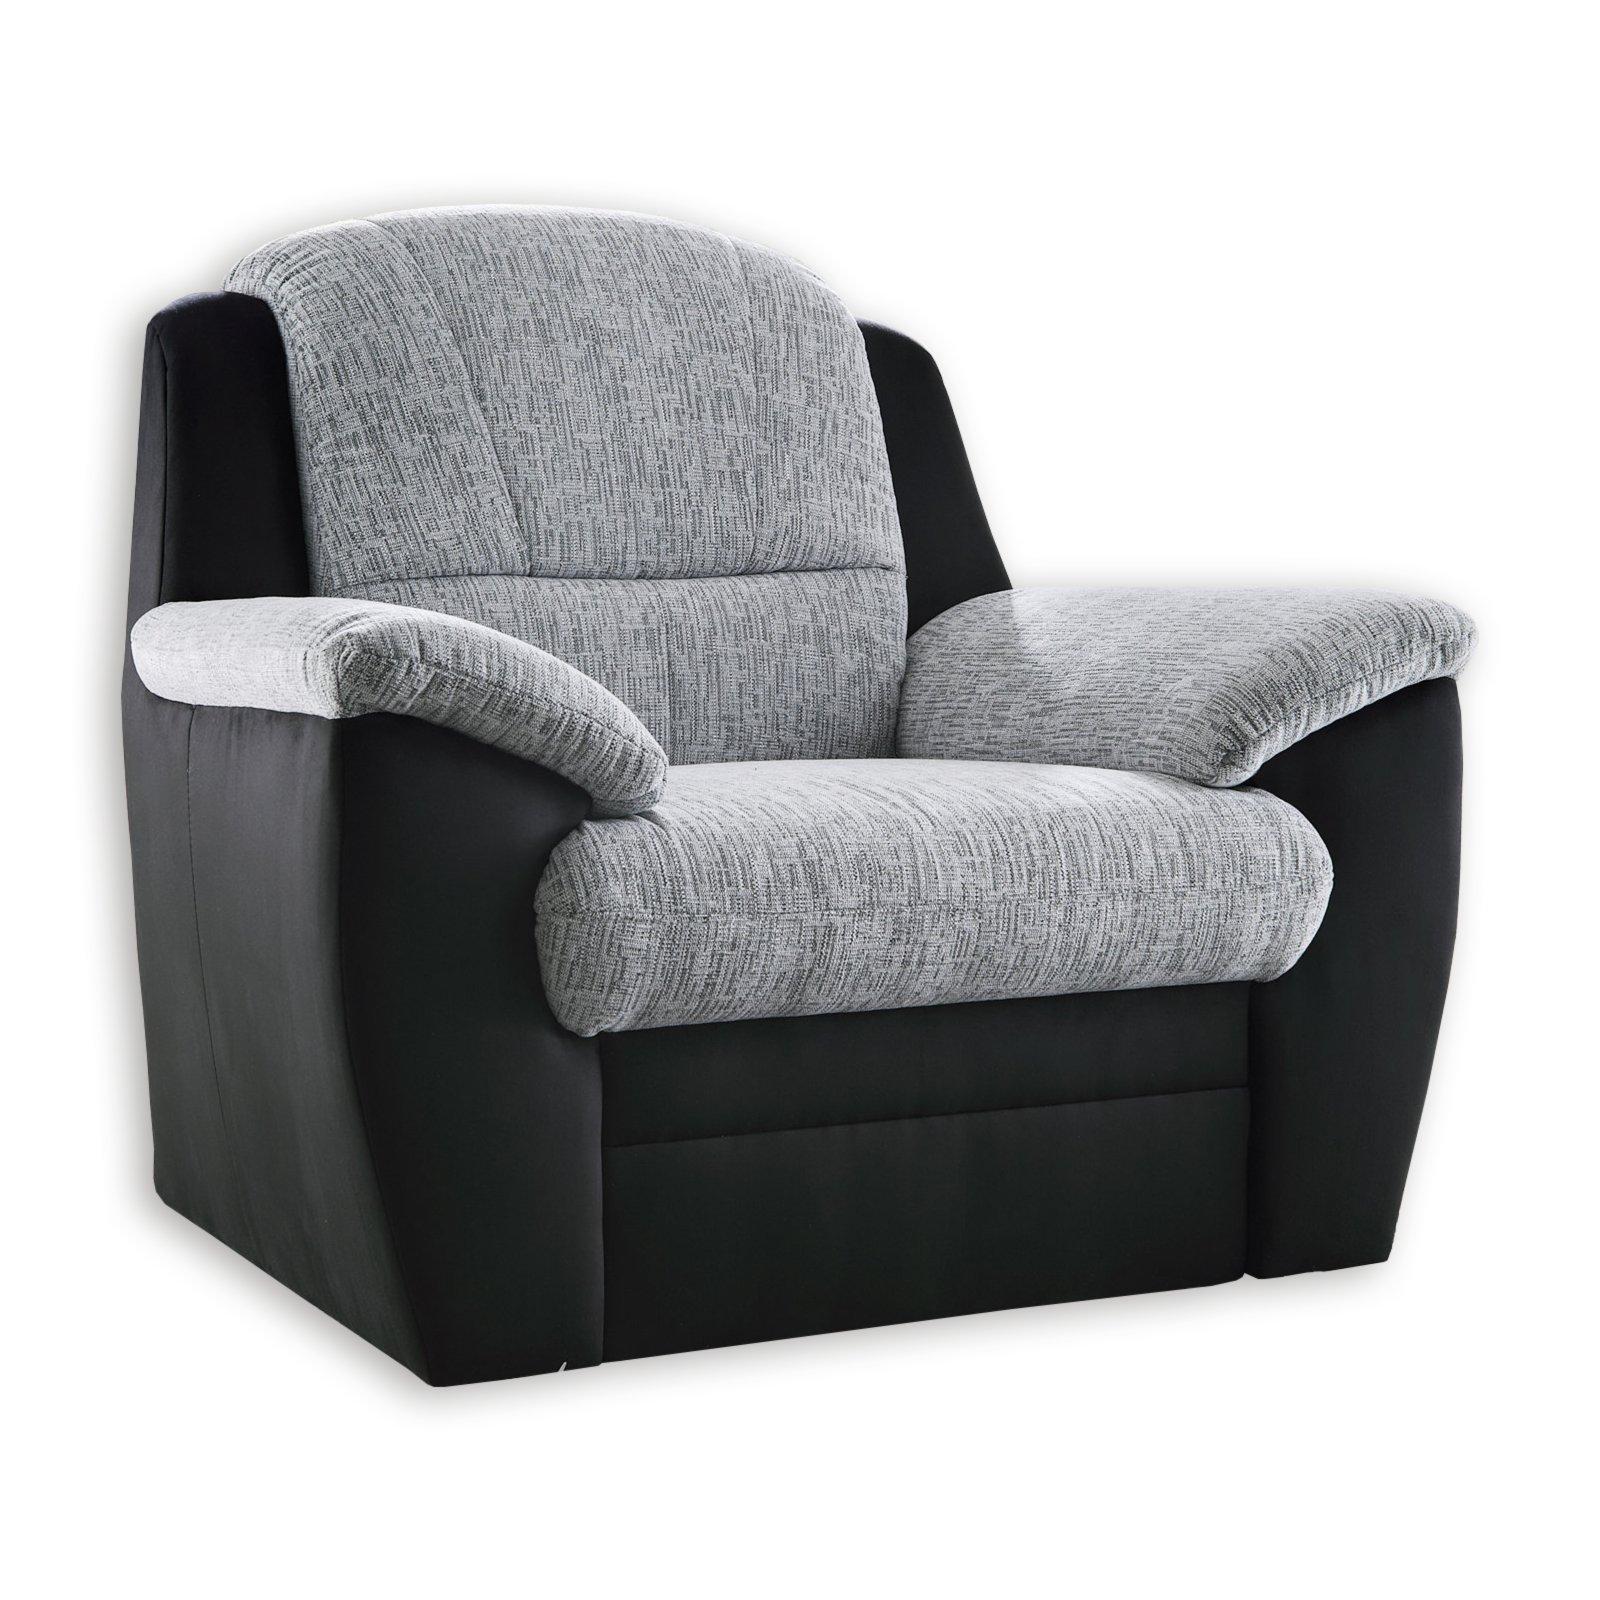 sessel anthrazit schwarz fernseh relaxsessel sessel hocker m bel m belhaus roller. Black Bedroom Furniture Sets. Home Design Ideas